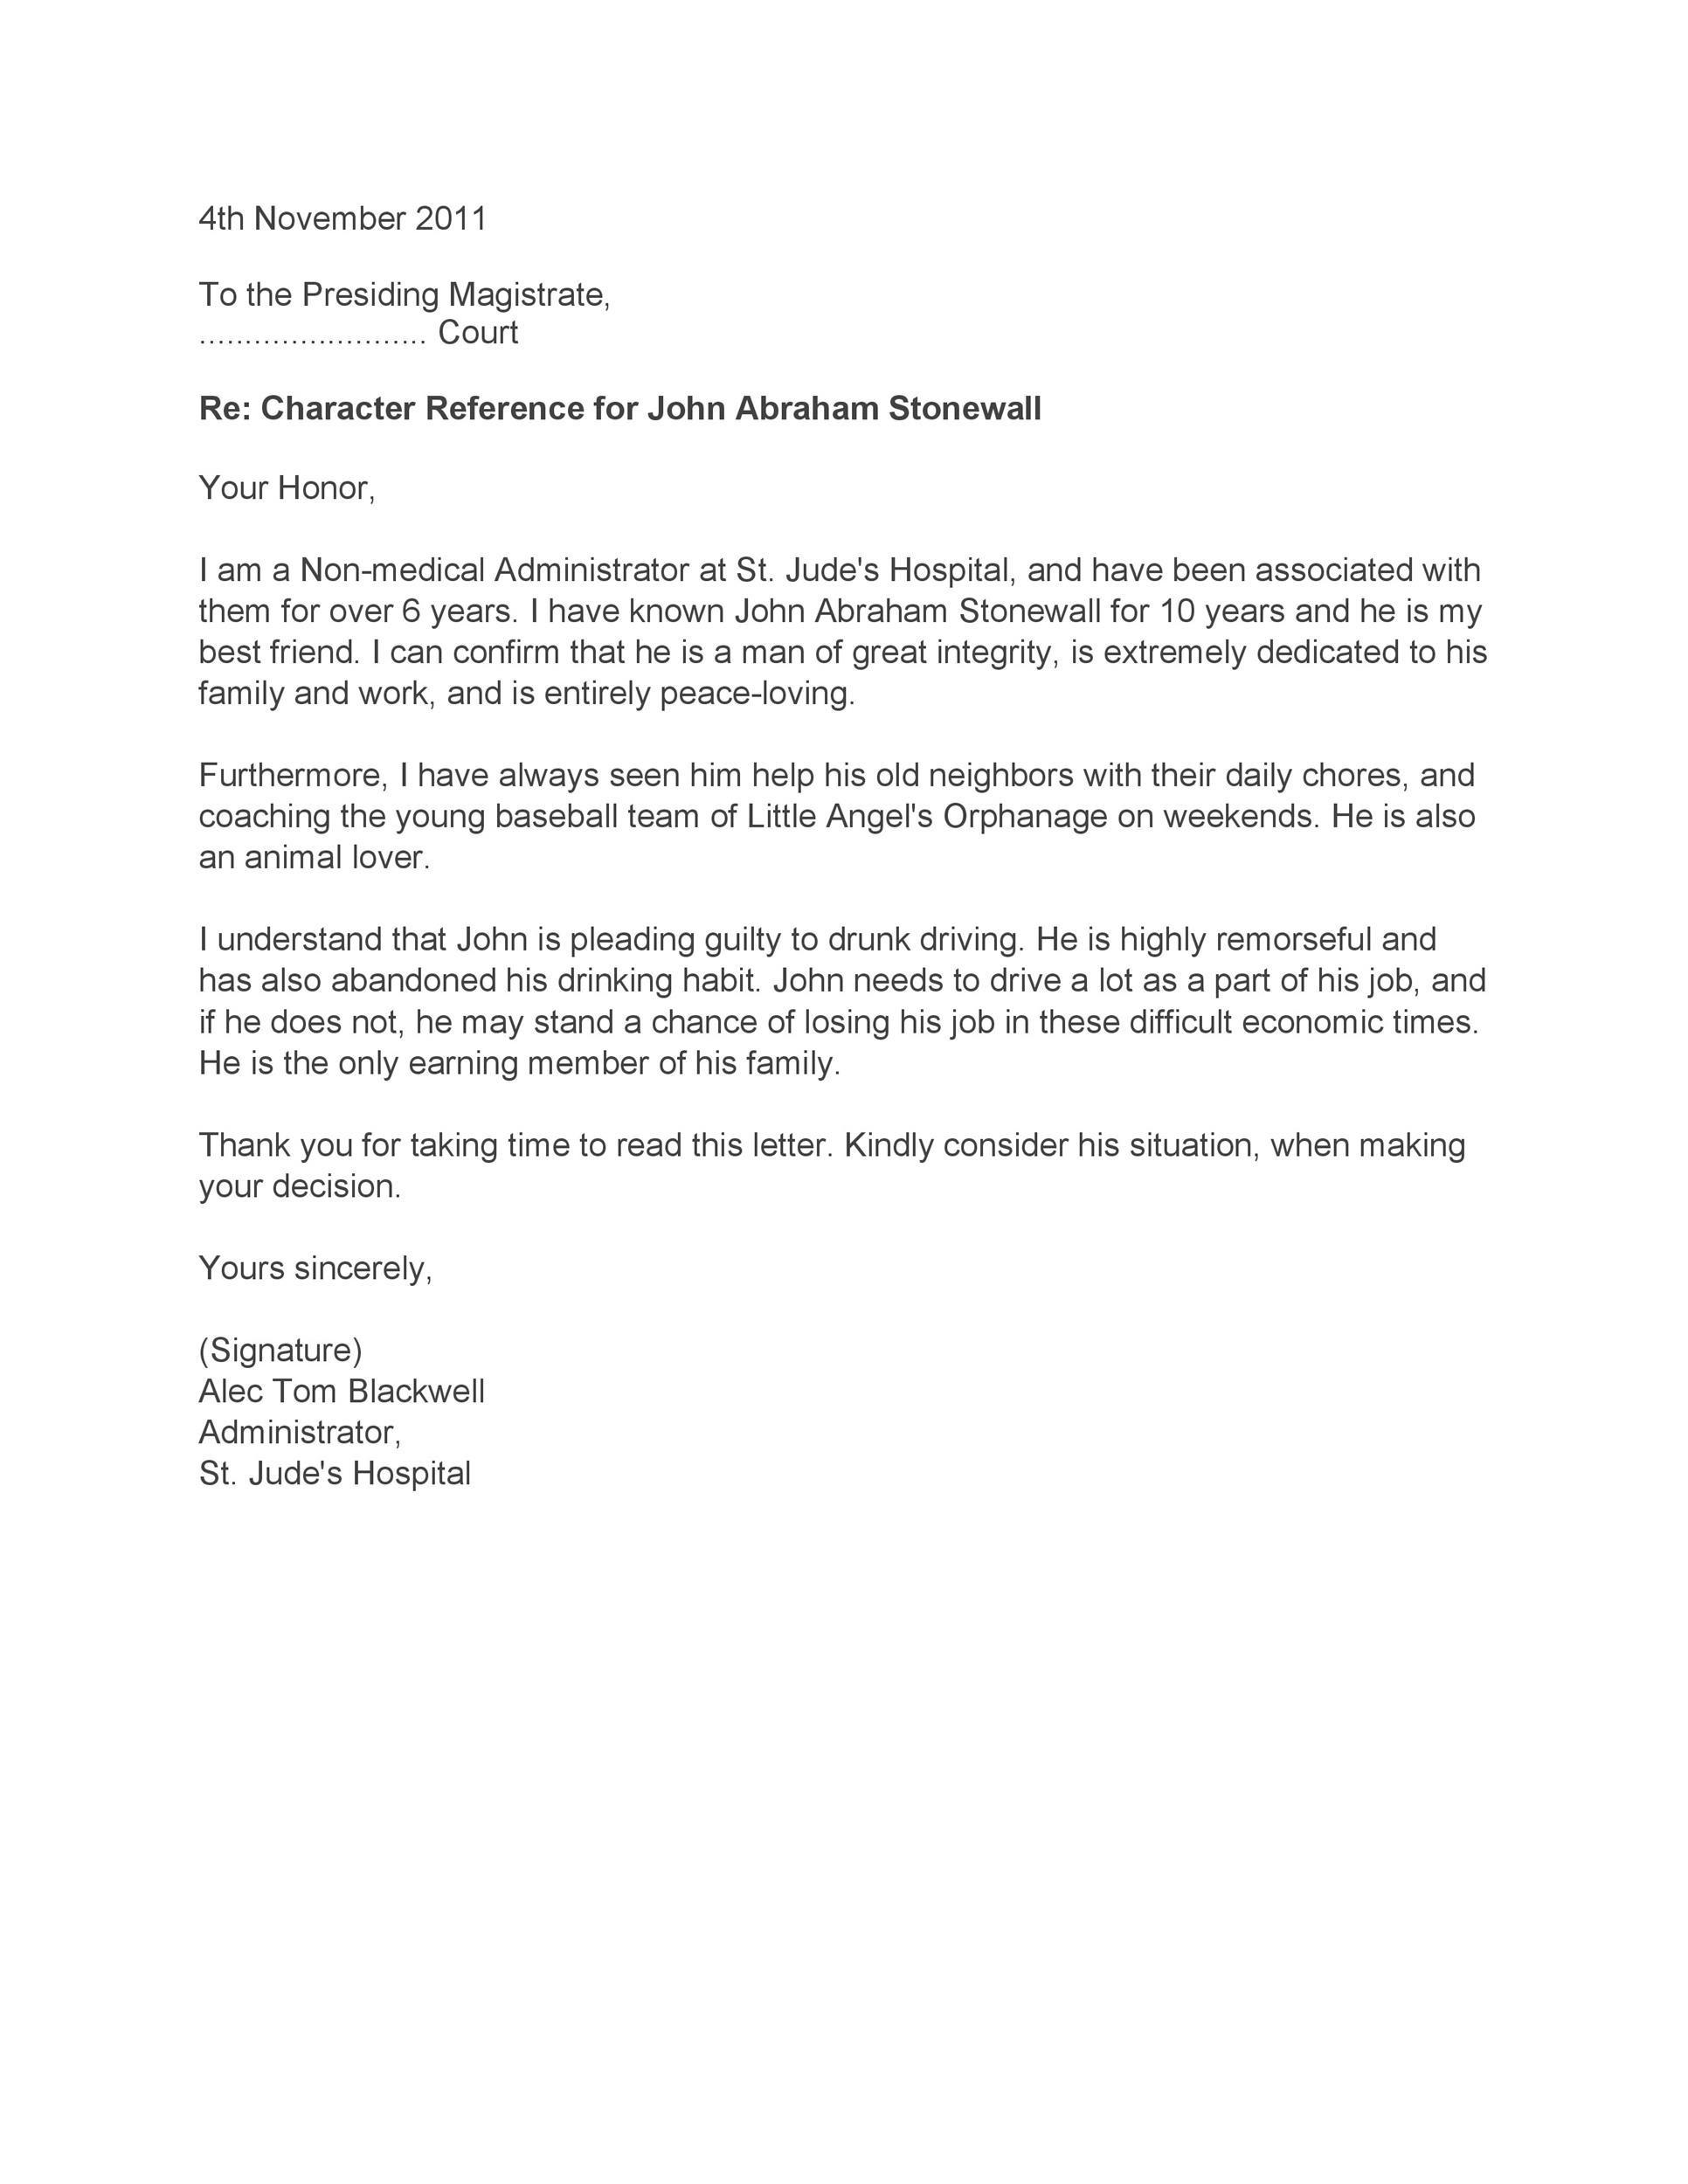 Sample Custody Letter To Judge from templatelab.com